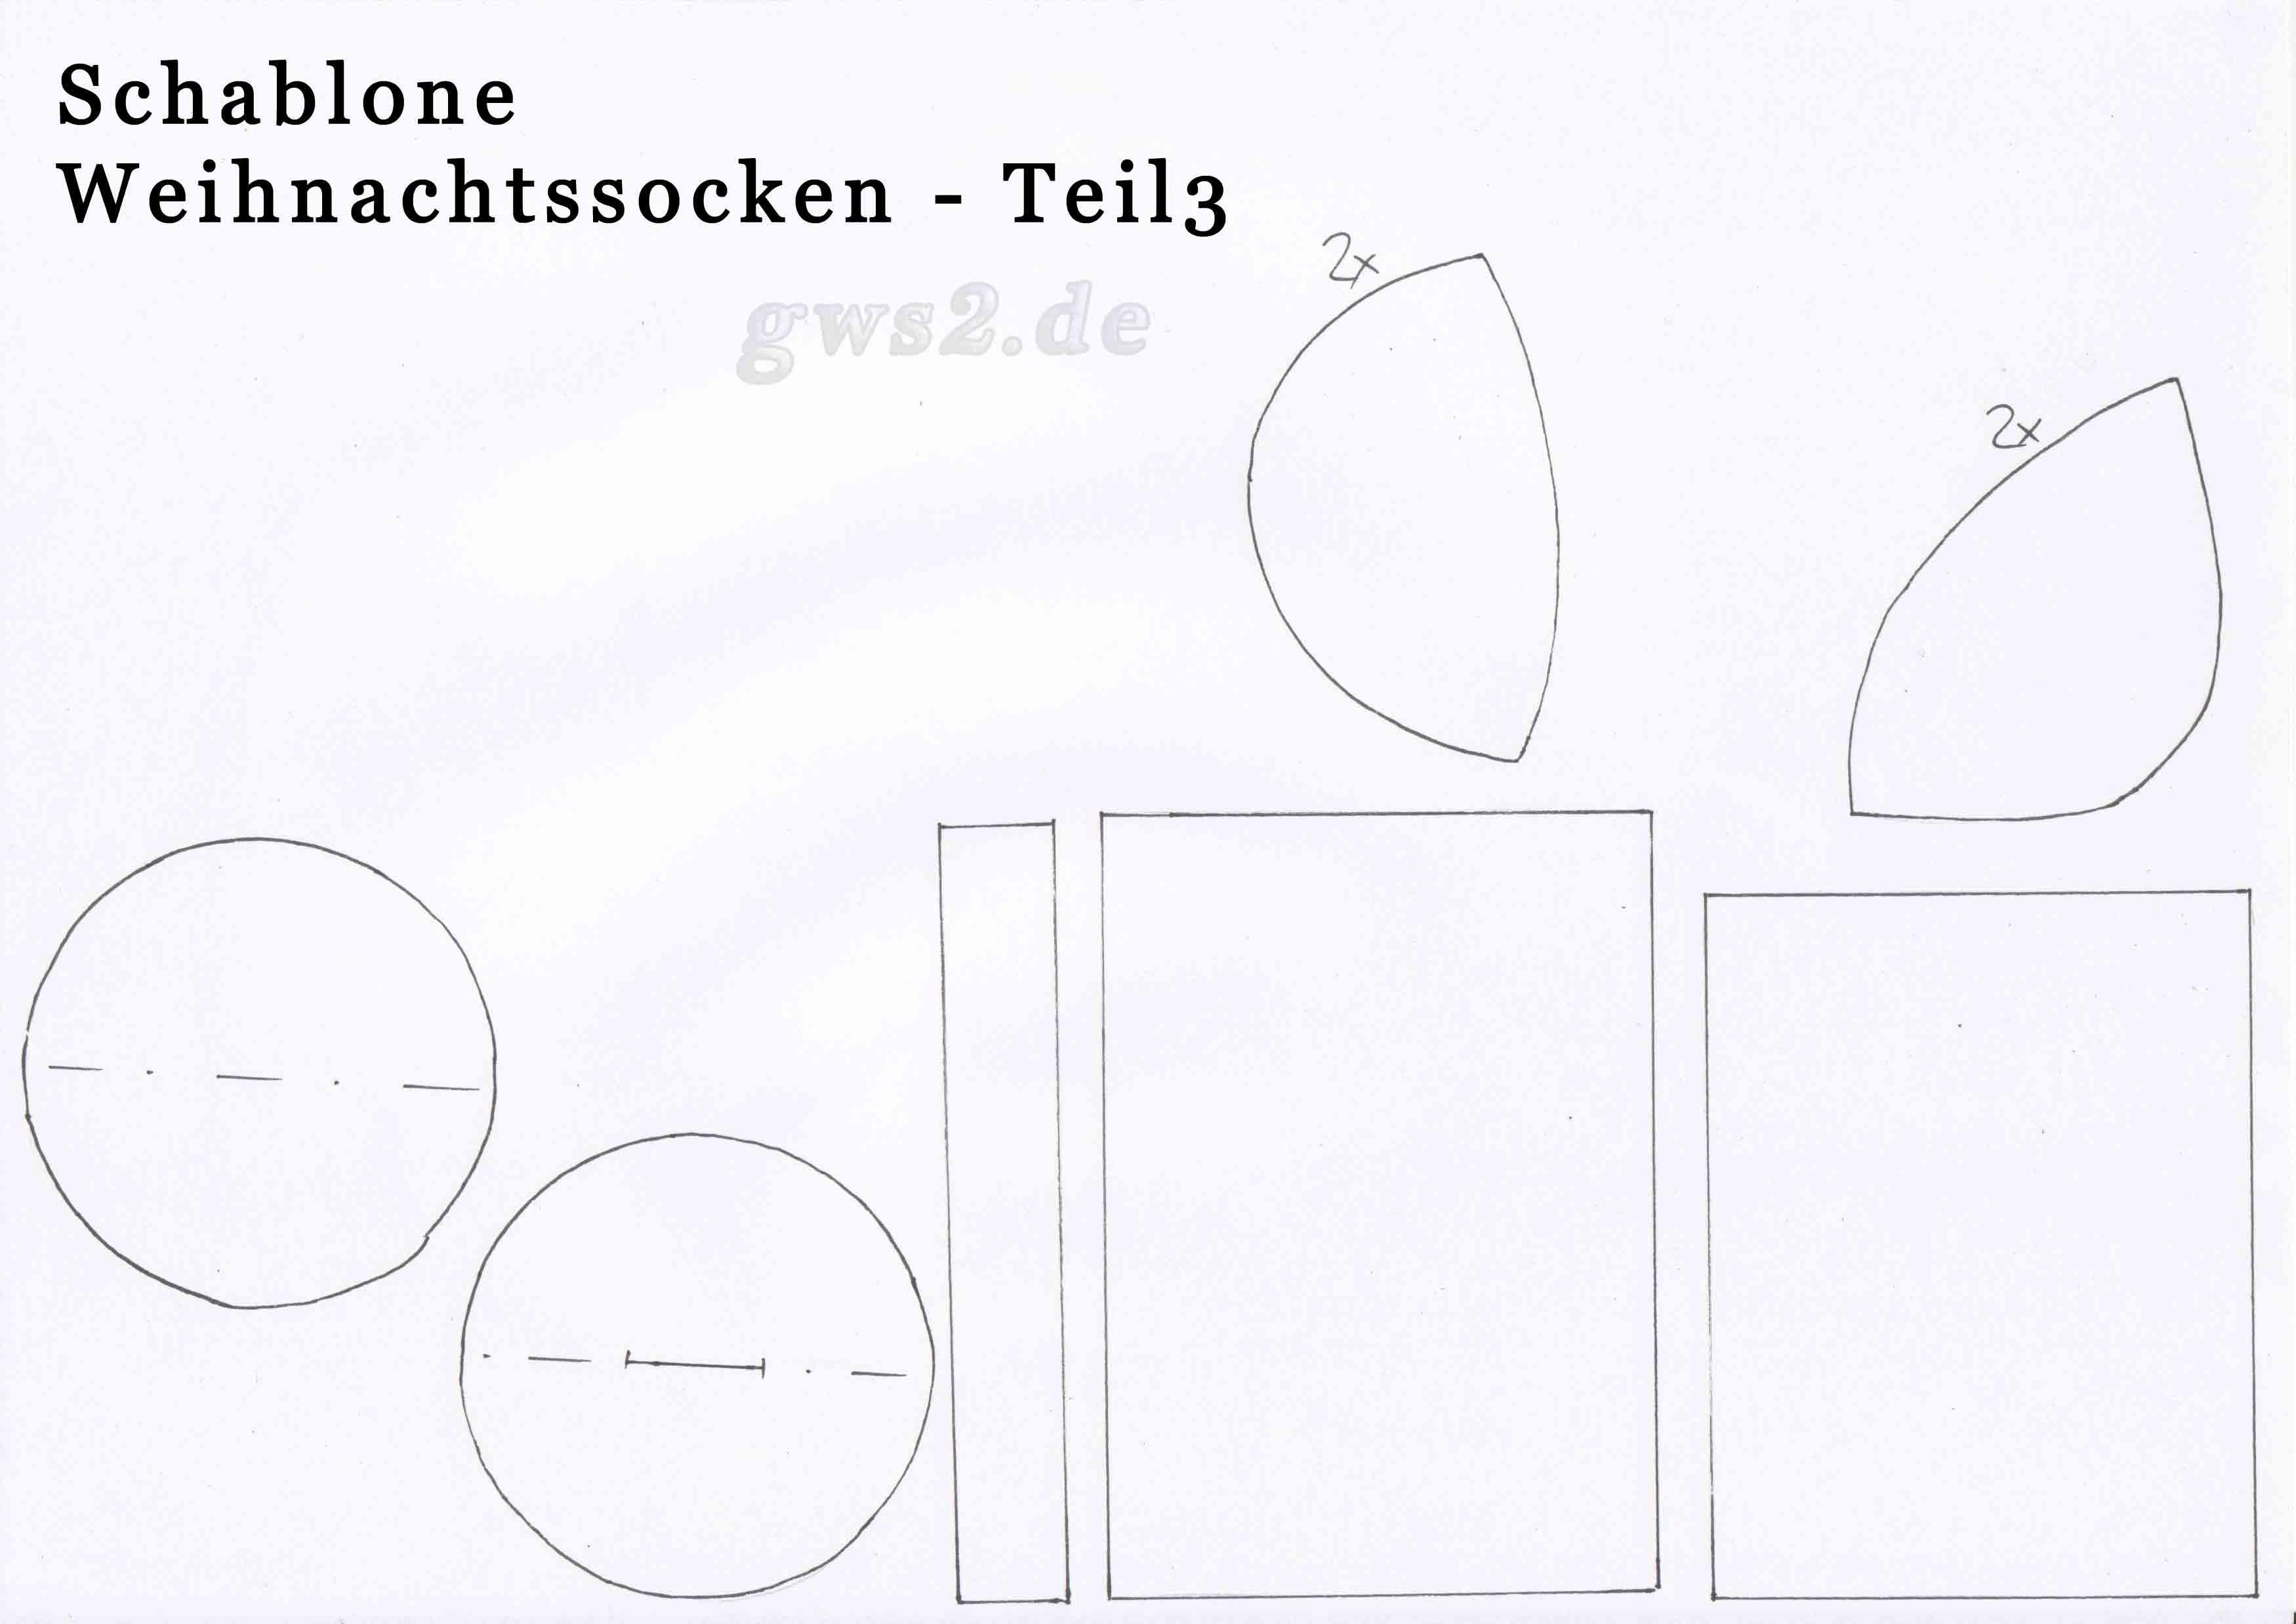 socken aus papier f r den nikolaus basteln. Black Bedroom Furniture Sets. Home Design Ideas